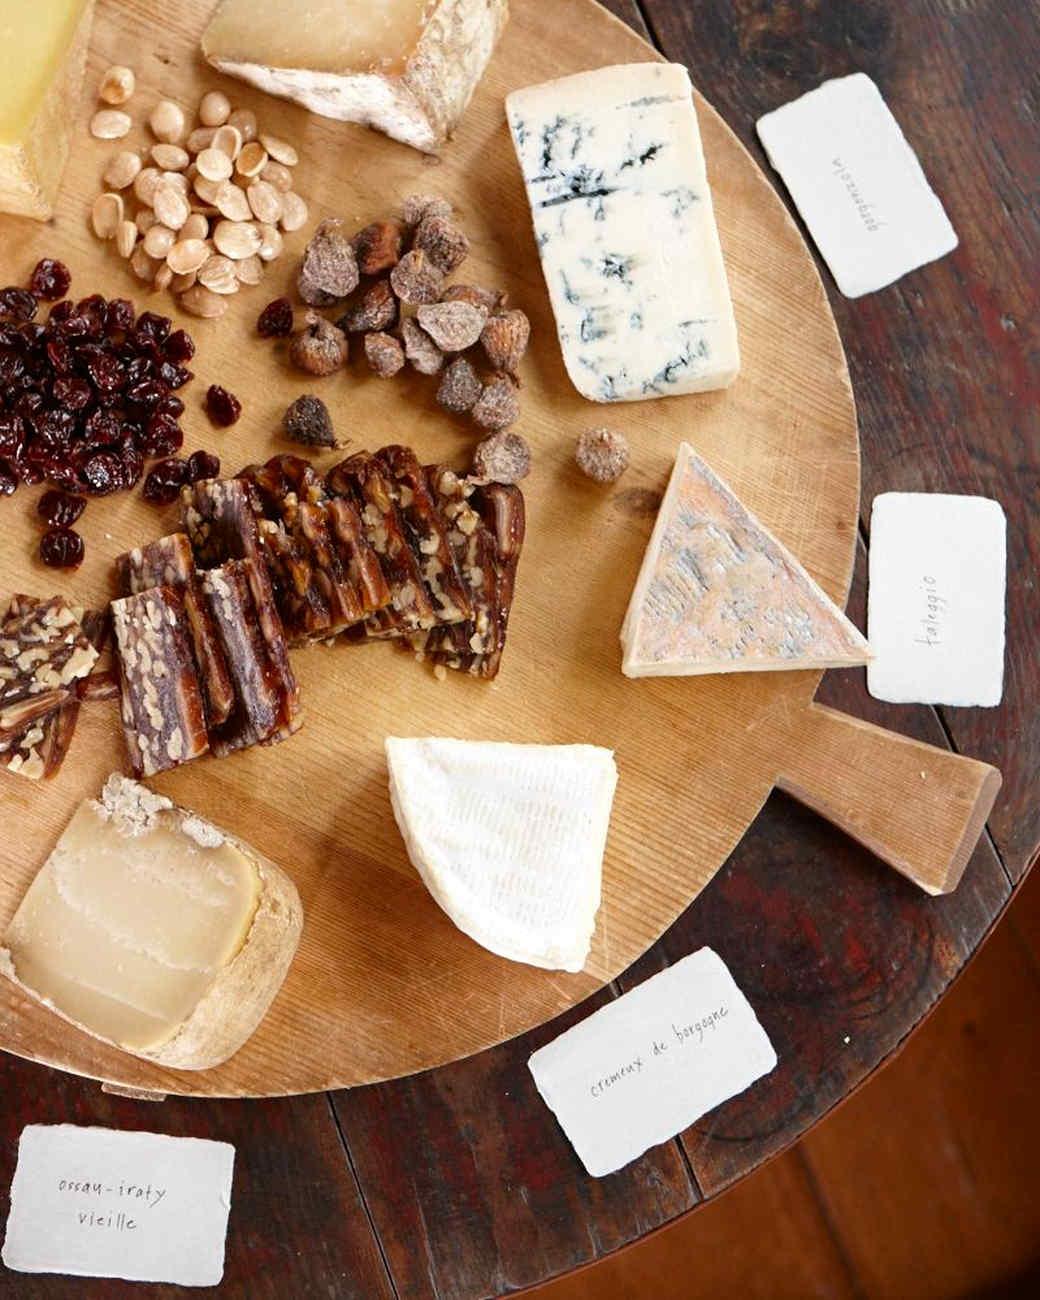 cheese-plate-ld107757.jpg